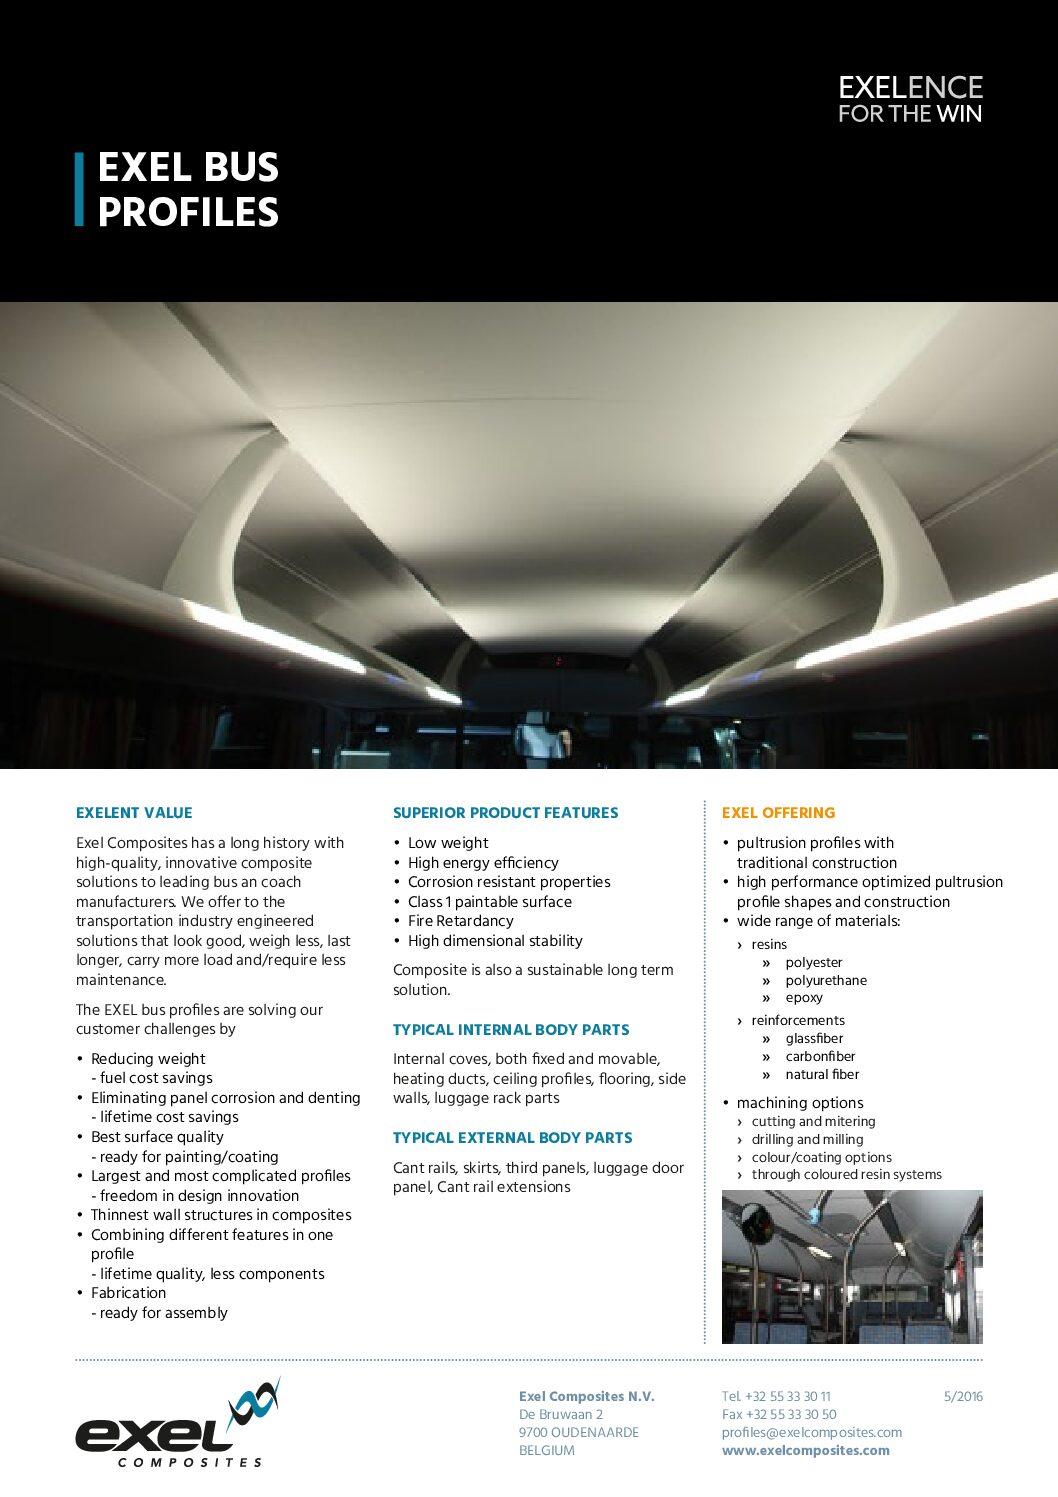 Exel Composites Bus Profiles